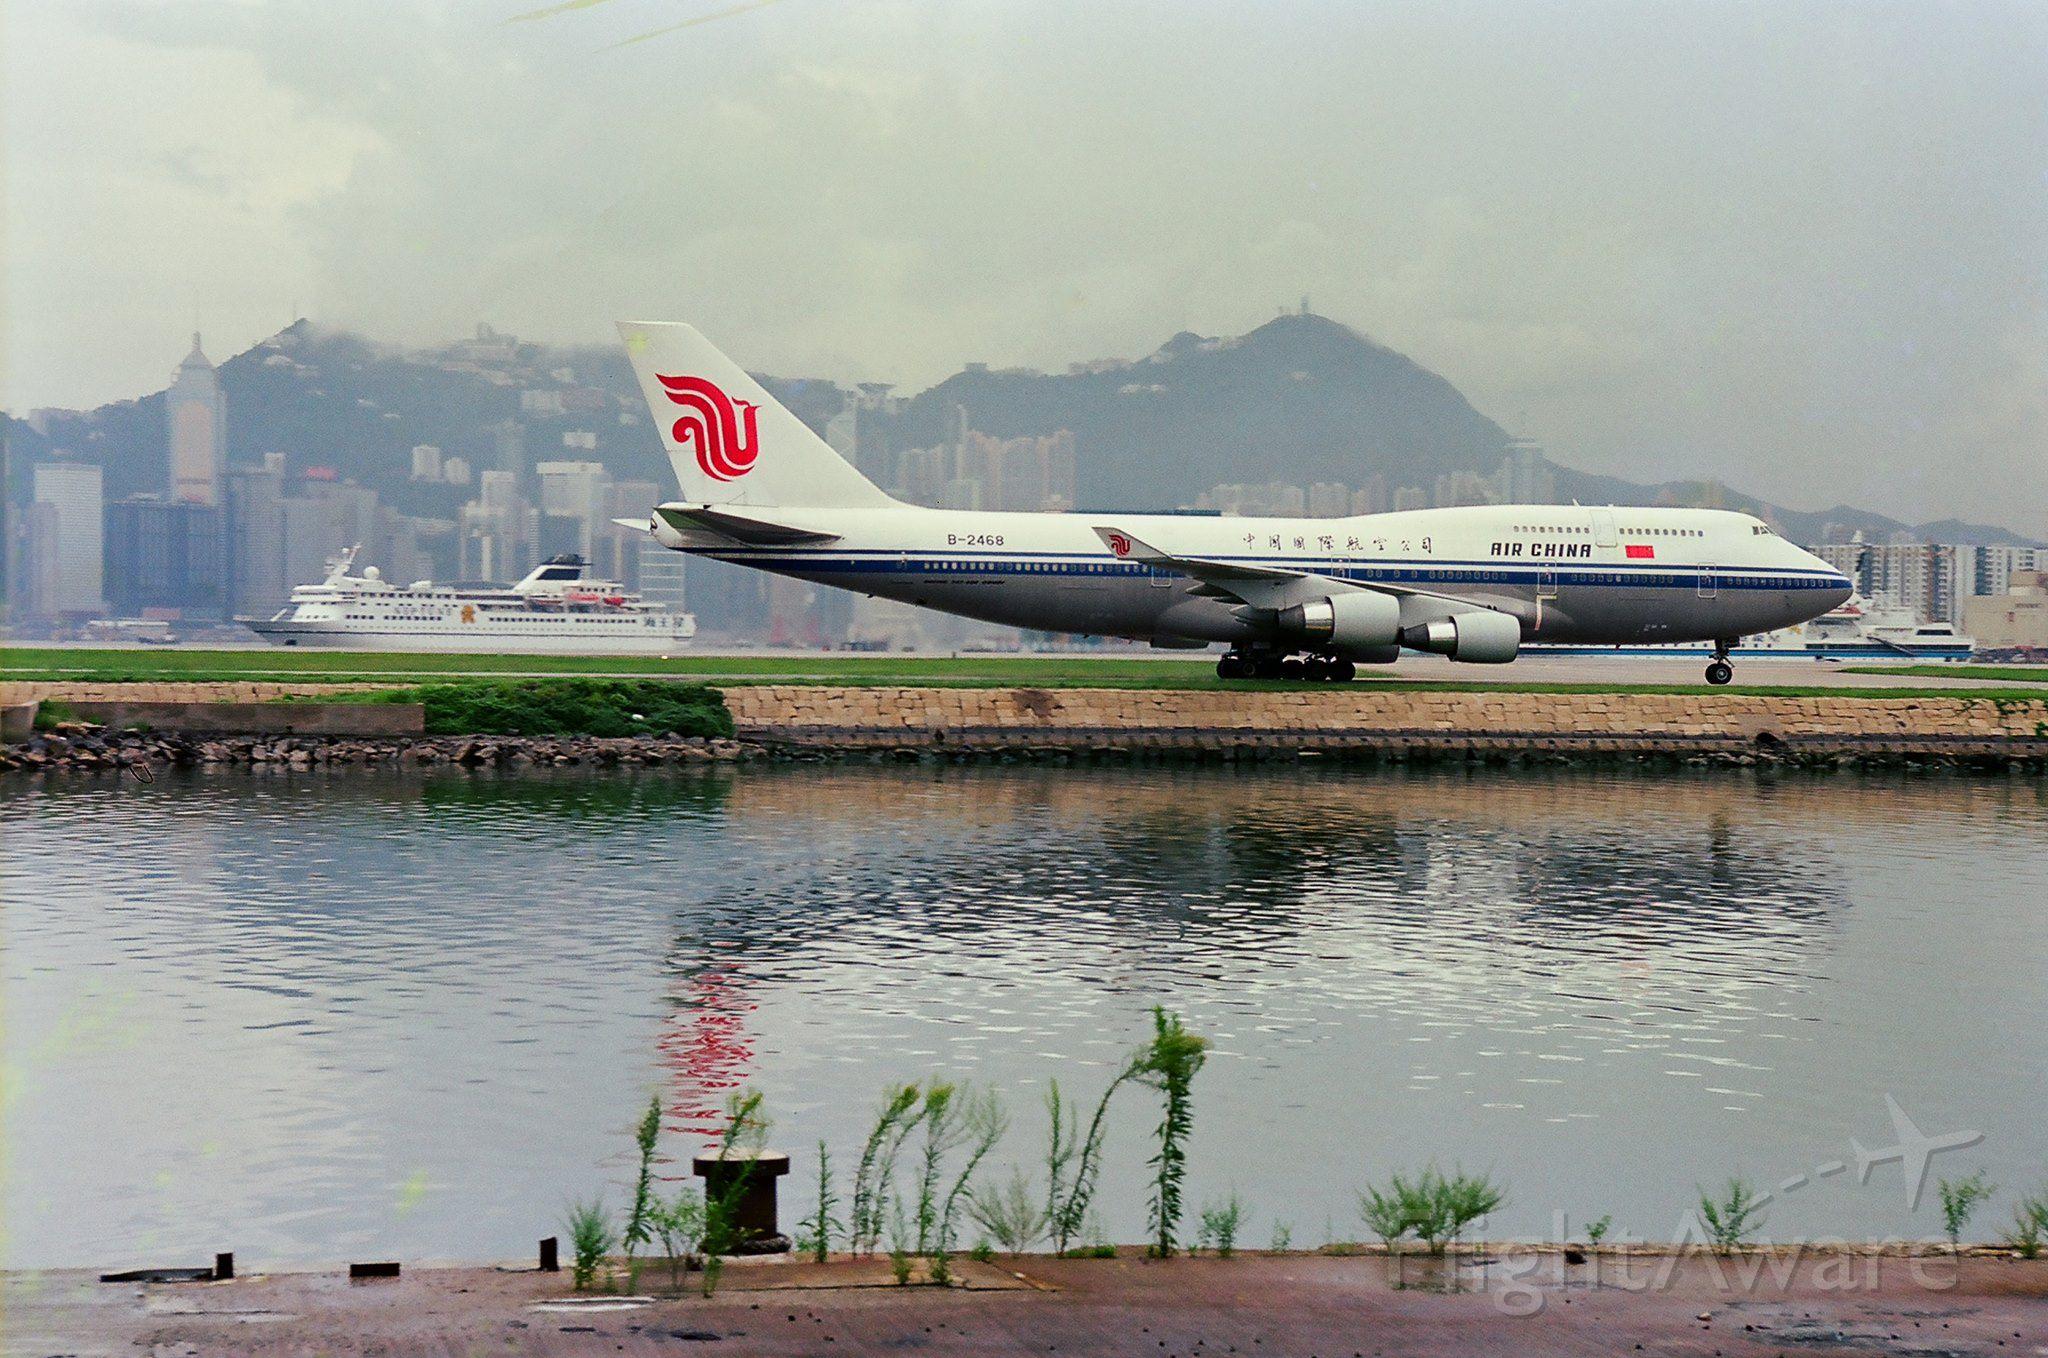 Boeing 747-400 (B-2468)